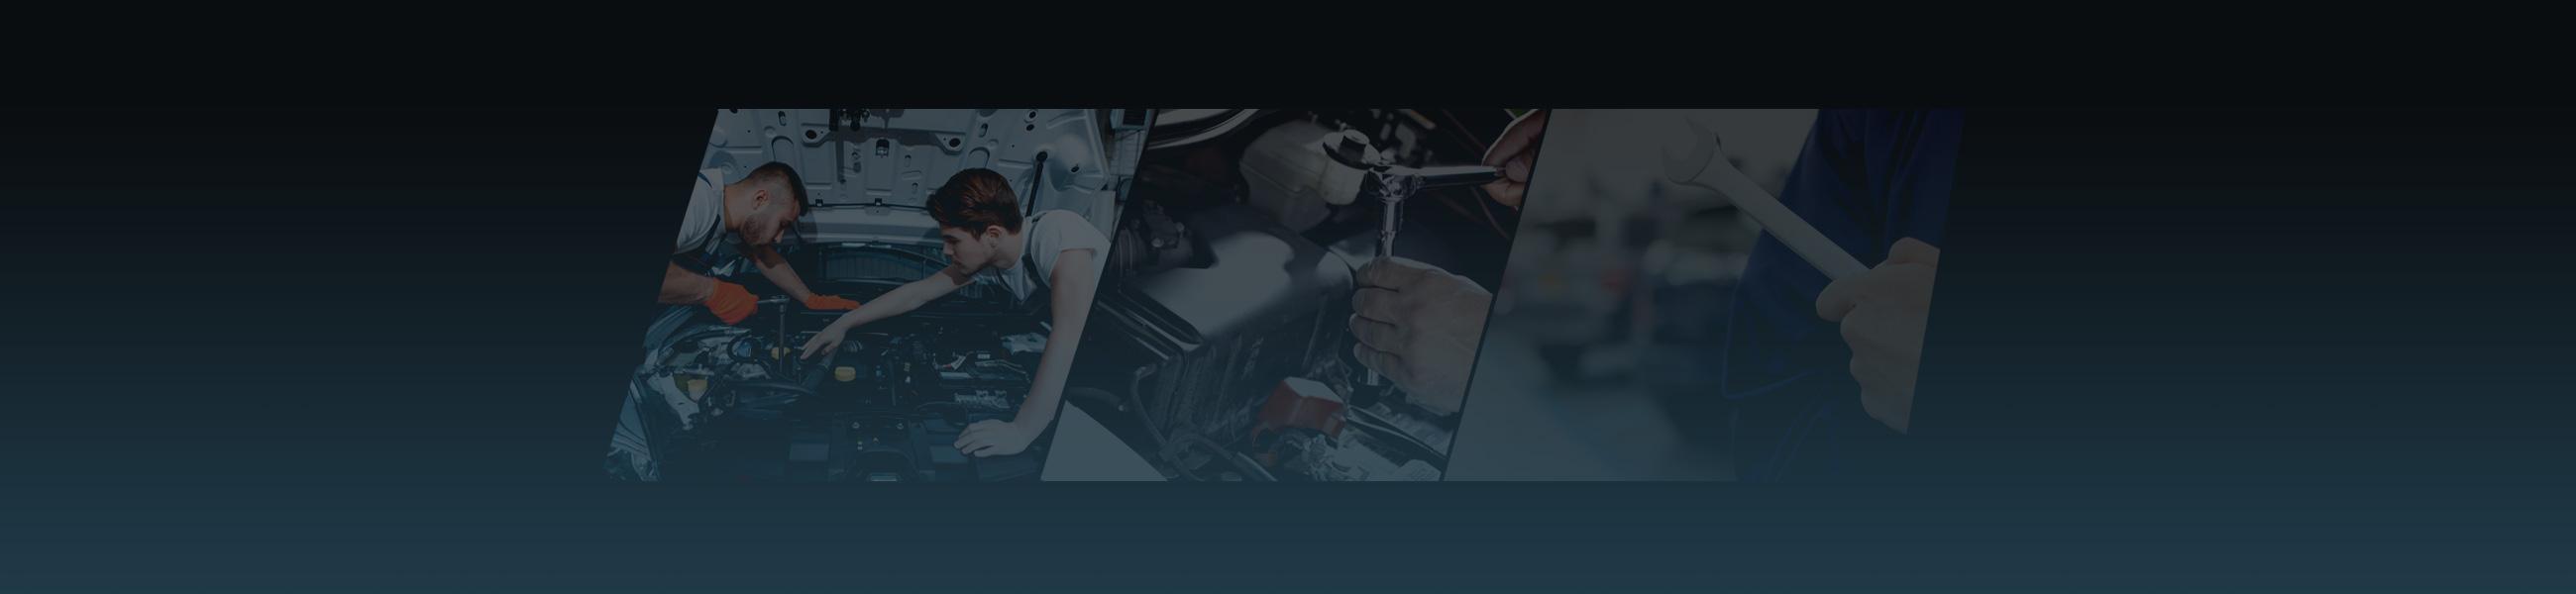 (85) 3227-9662 - Mecânica Especializada | ZF AutoCar